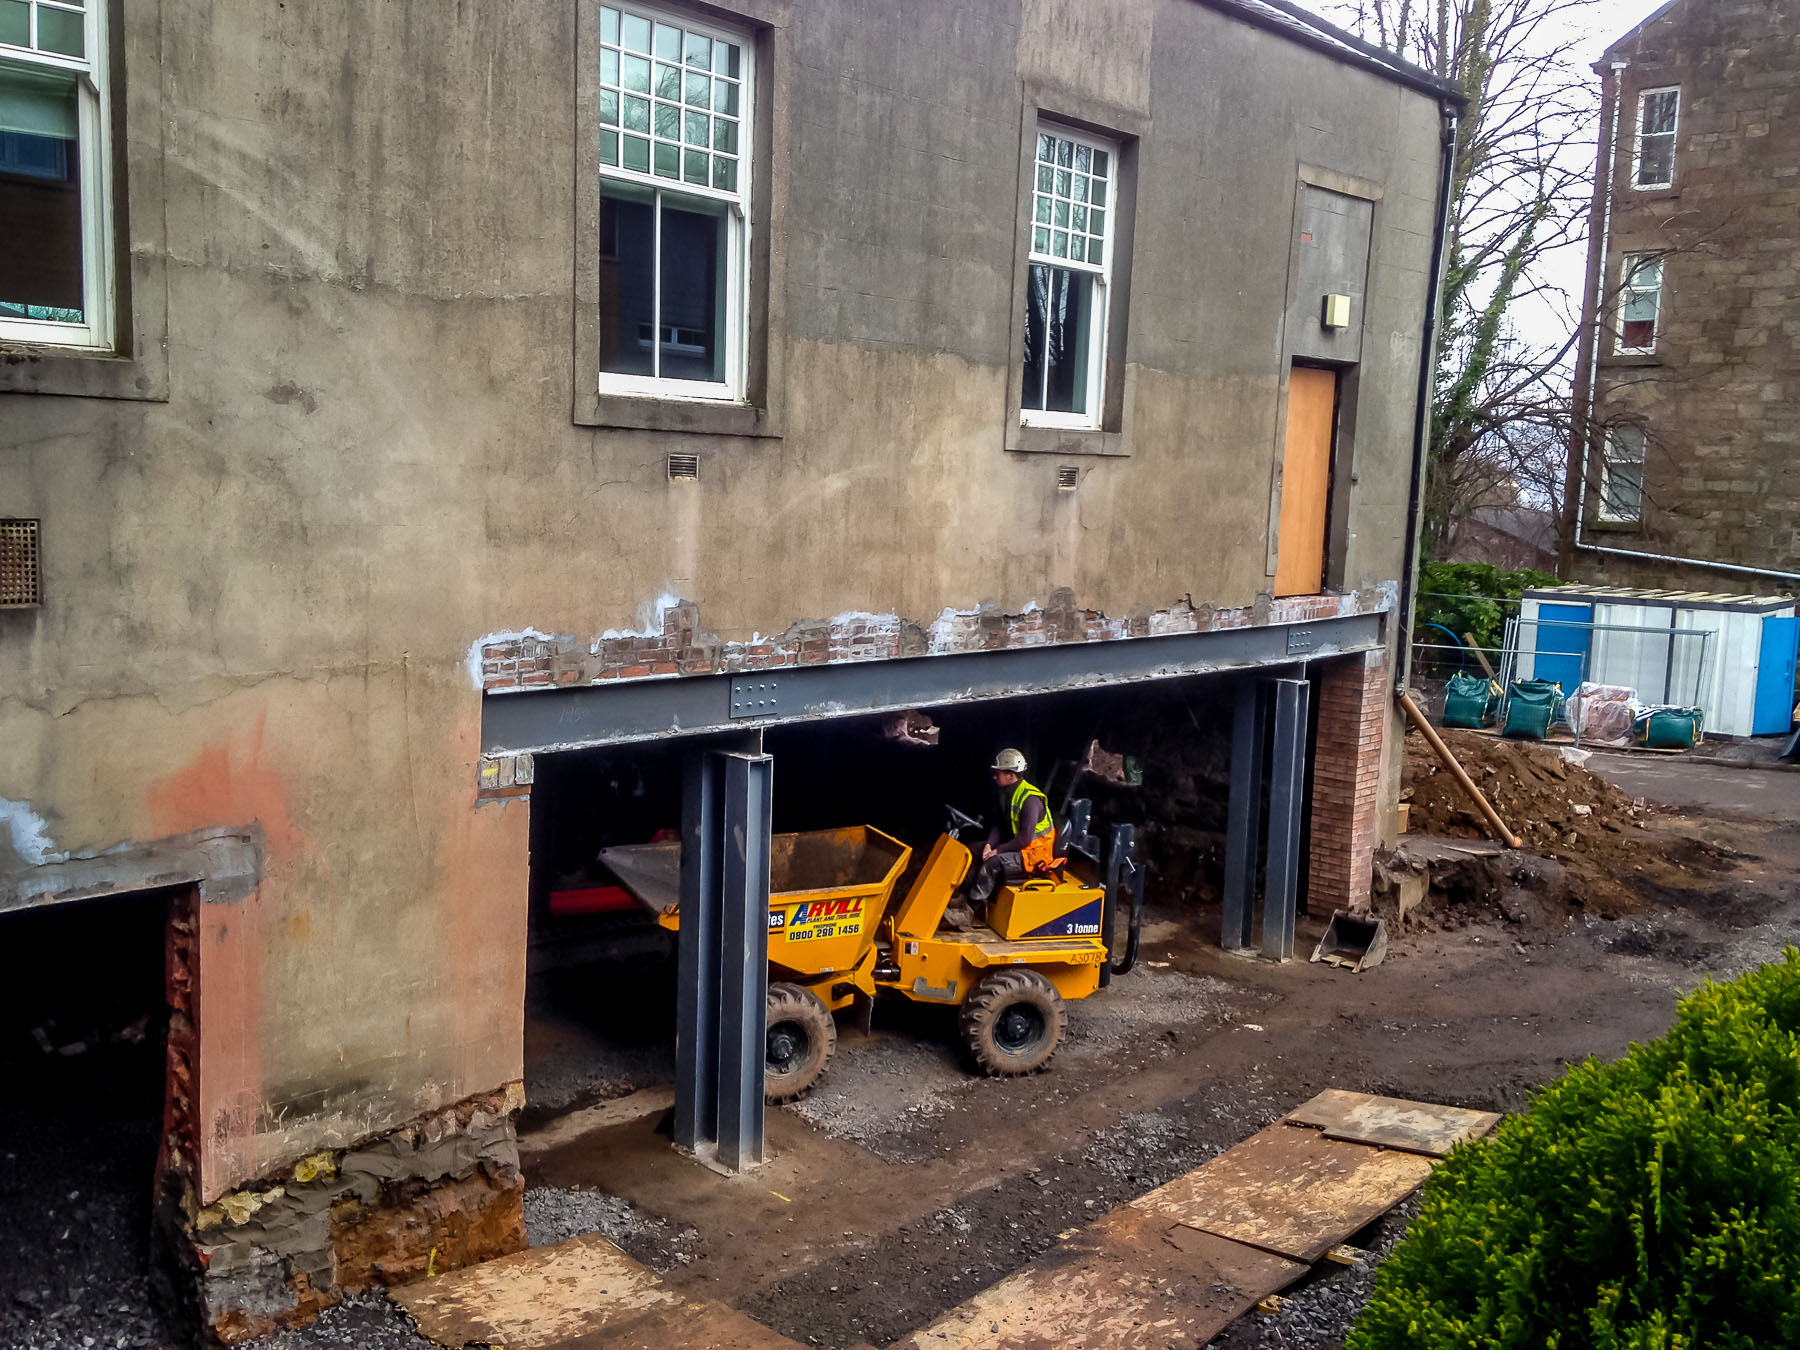 Man on excavator inside building